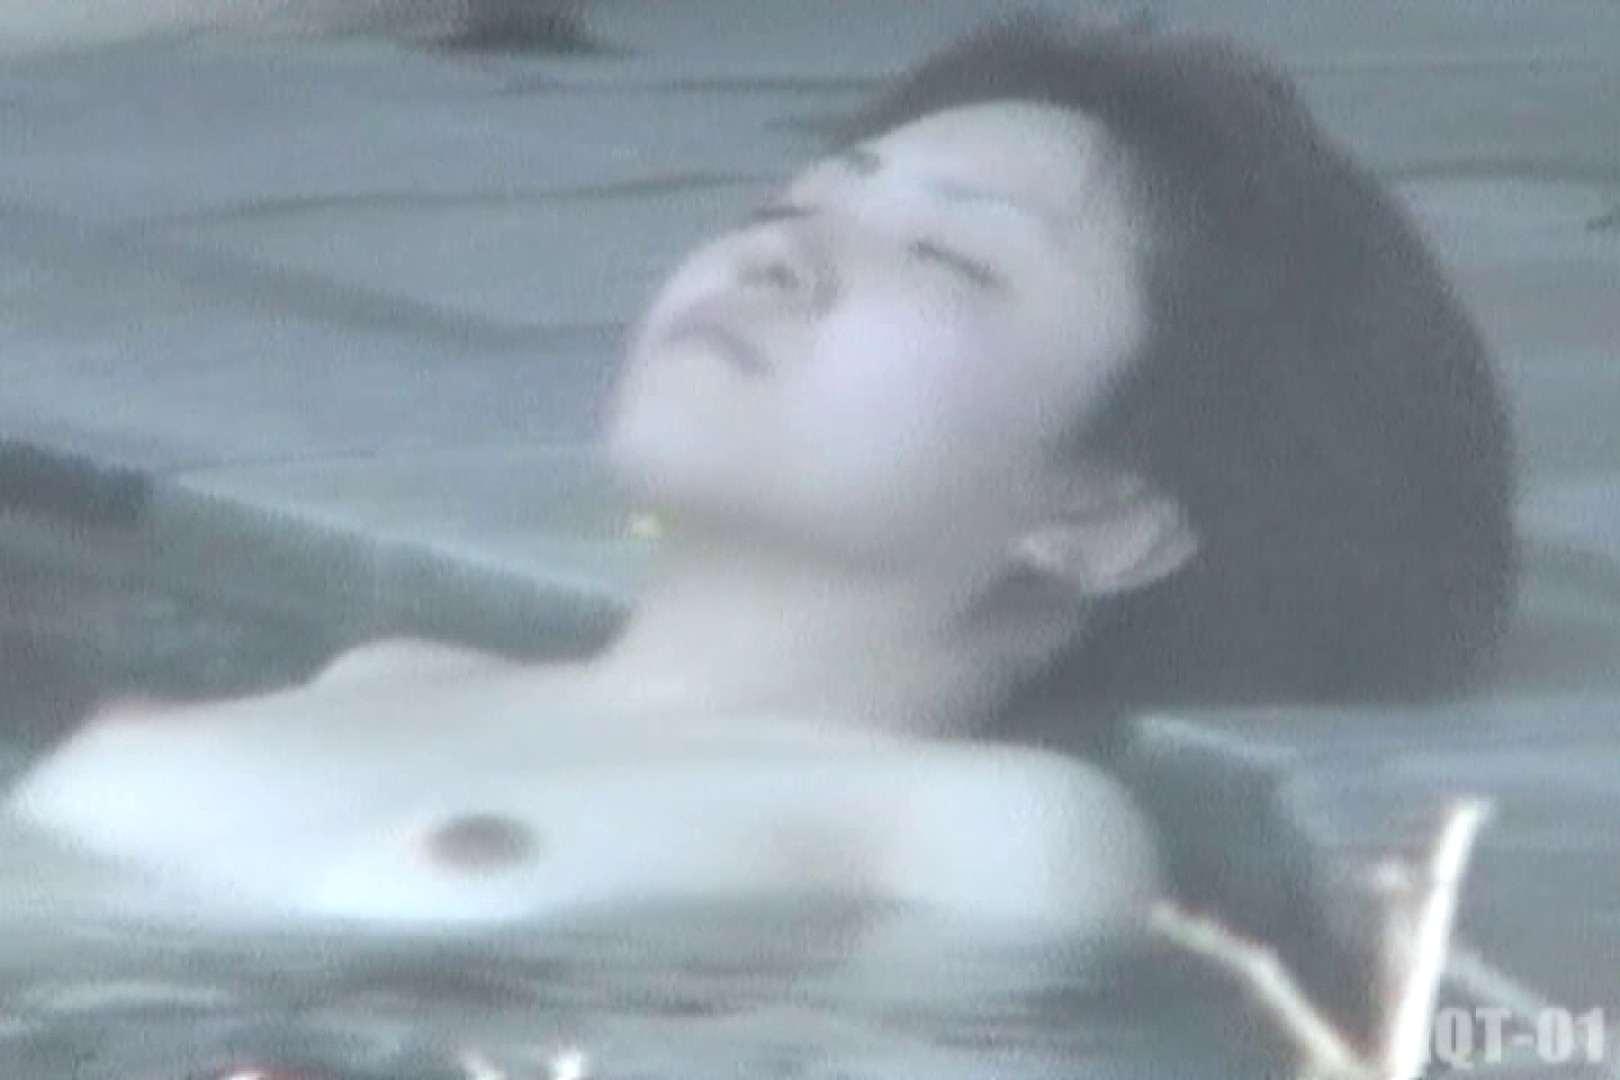 Aquaな露天風呂Vol.720 綺麗なOLたち AV無料動画キャプチャ 98枚 8